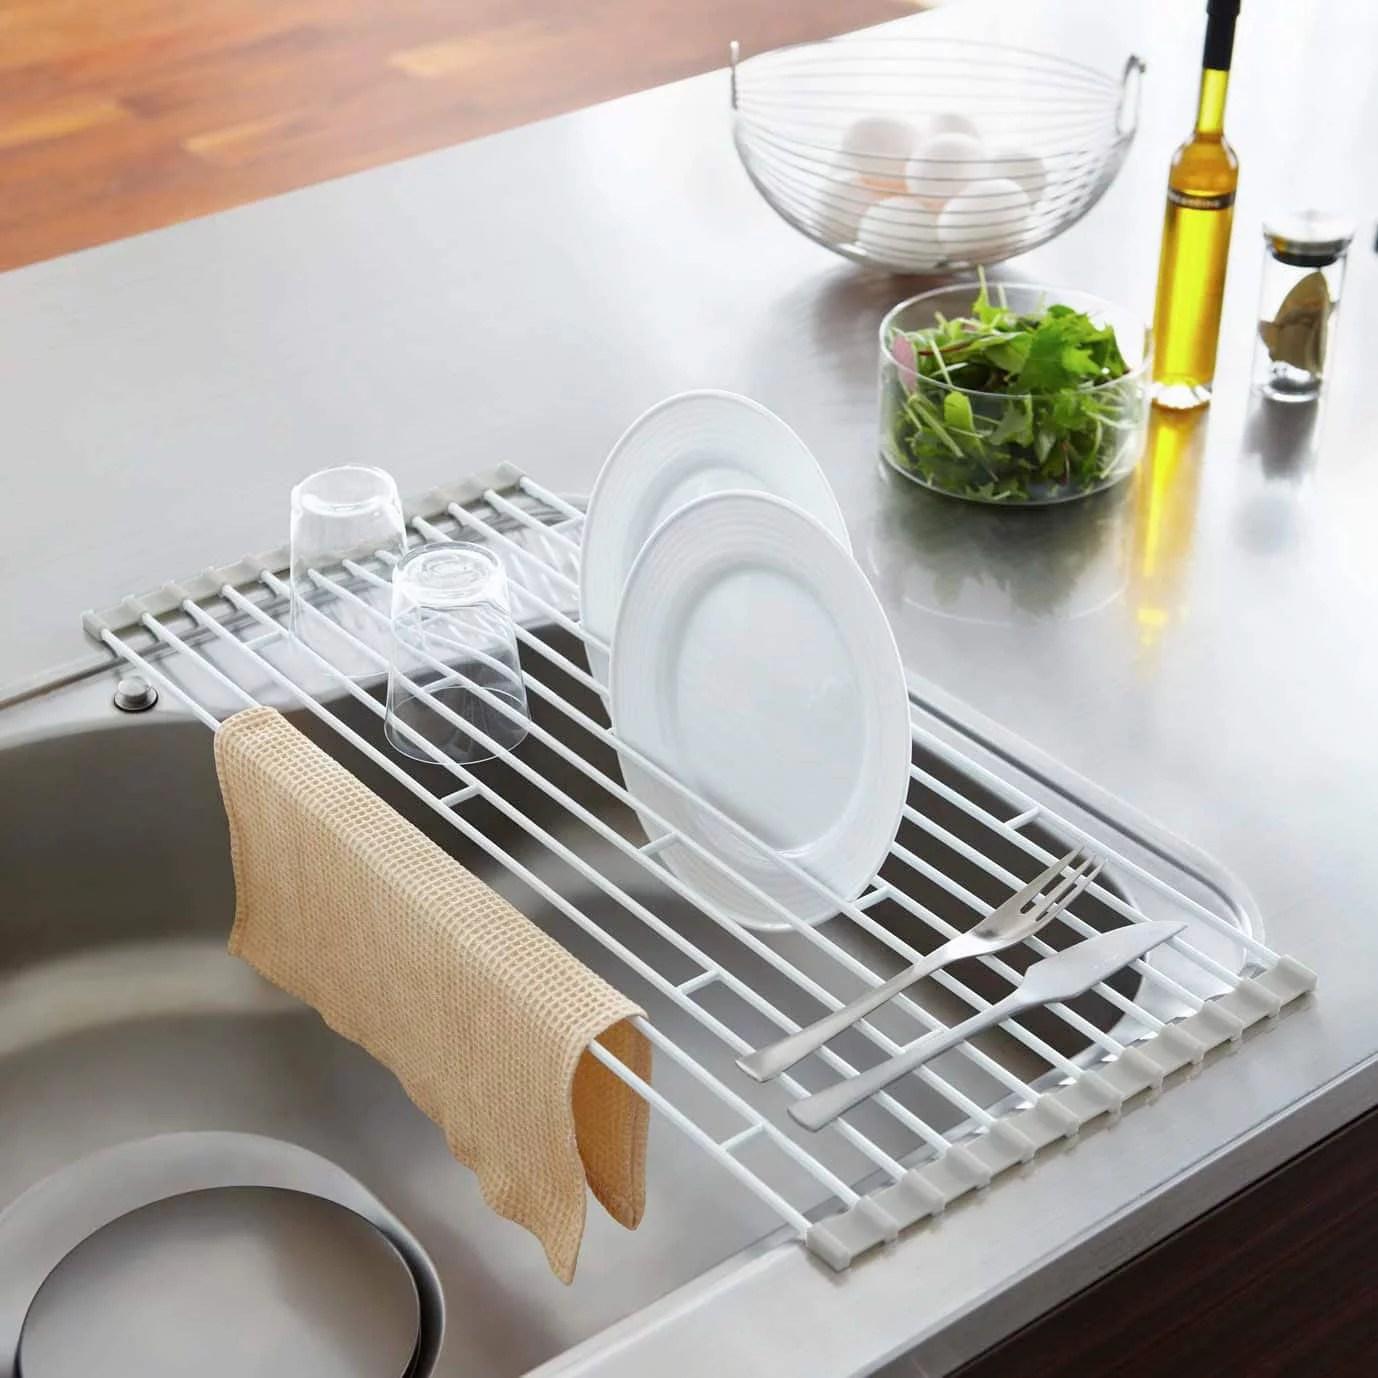 yamazaki home plate over the sink folding drying rack